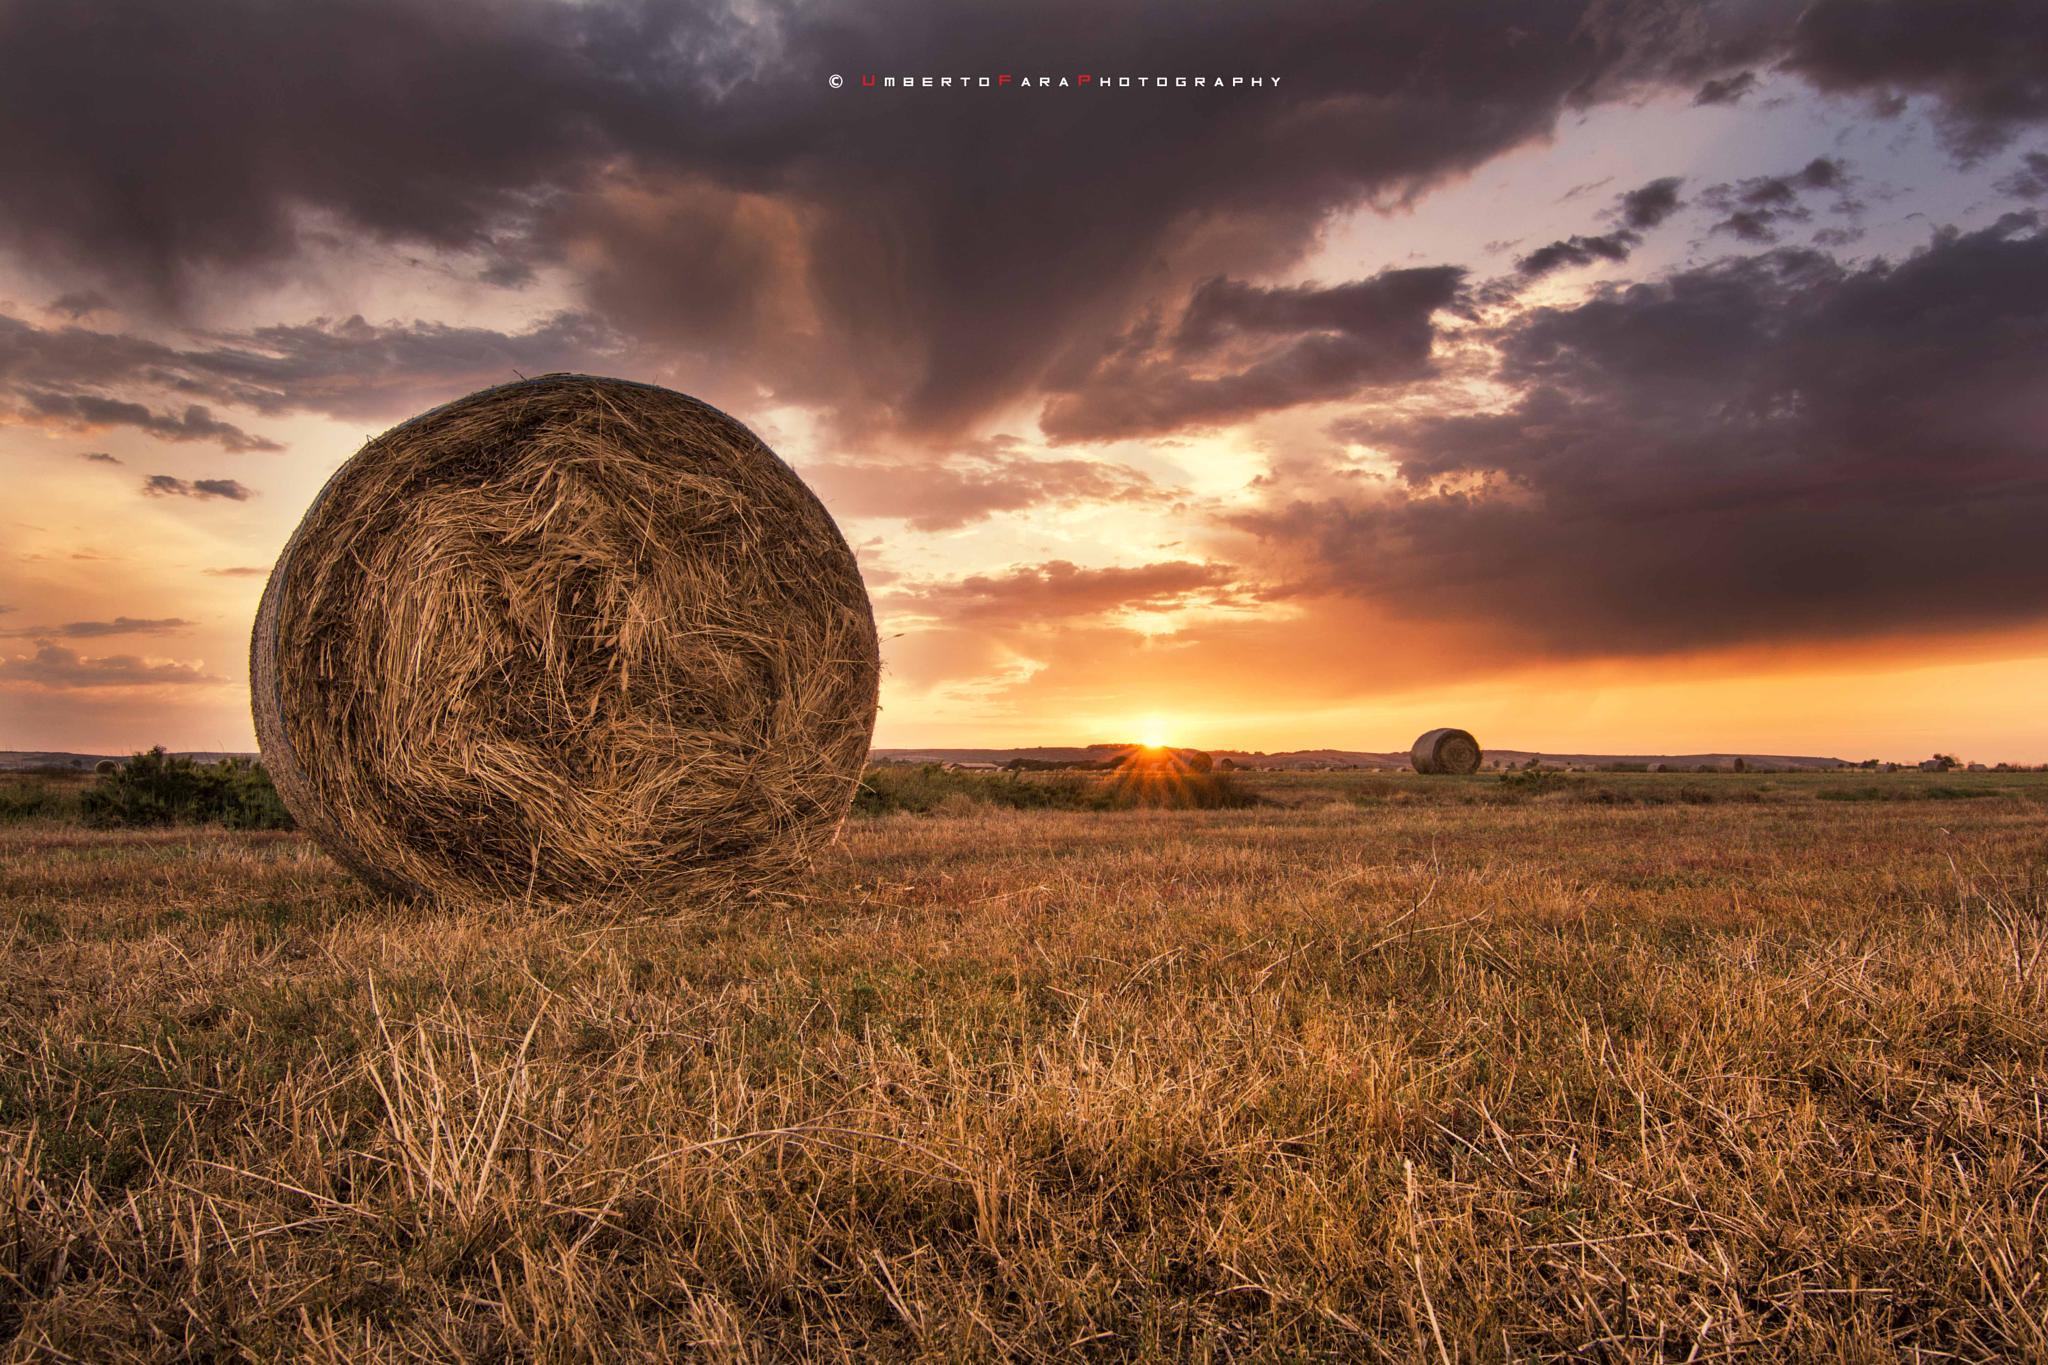 sunlight by Umberto Fara Photography